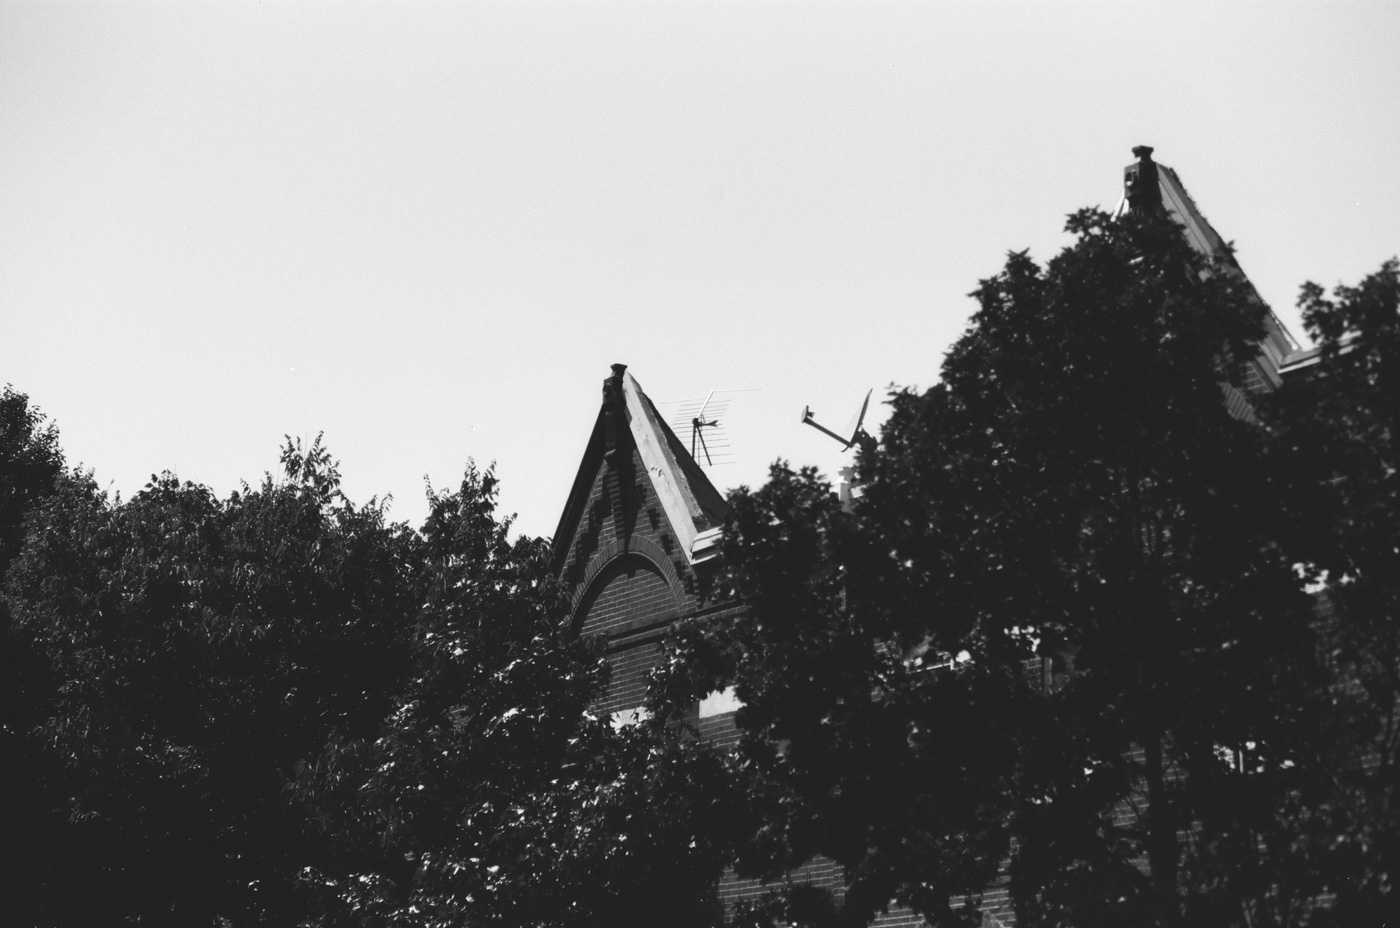 Rooftop Antennae